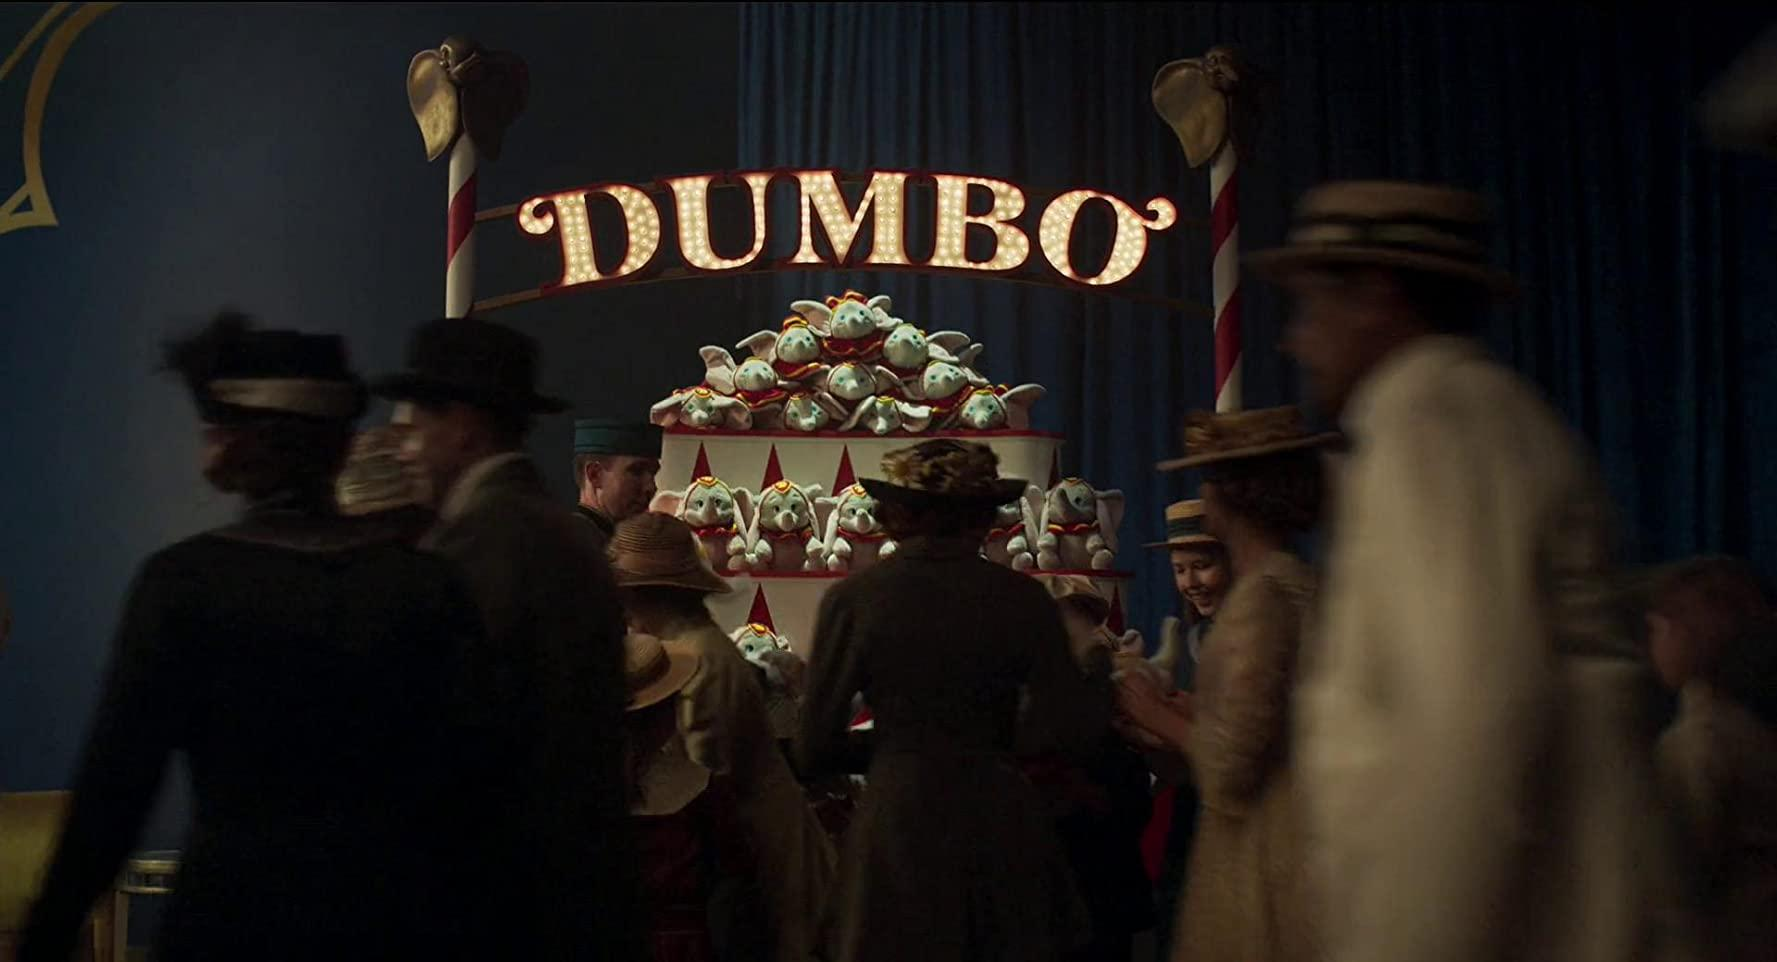 مشاهدة فيلم Dumbo (2019) مترجم HD اون لاين